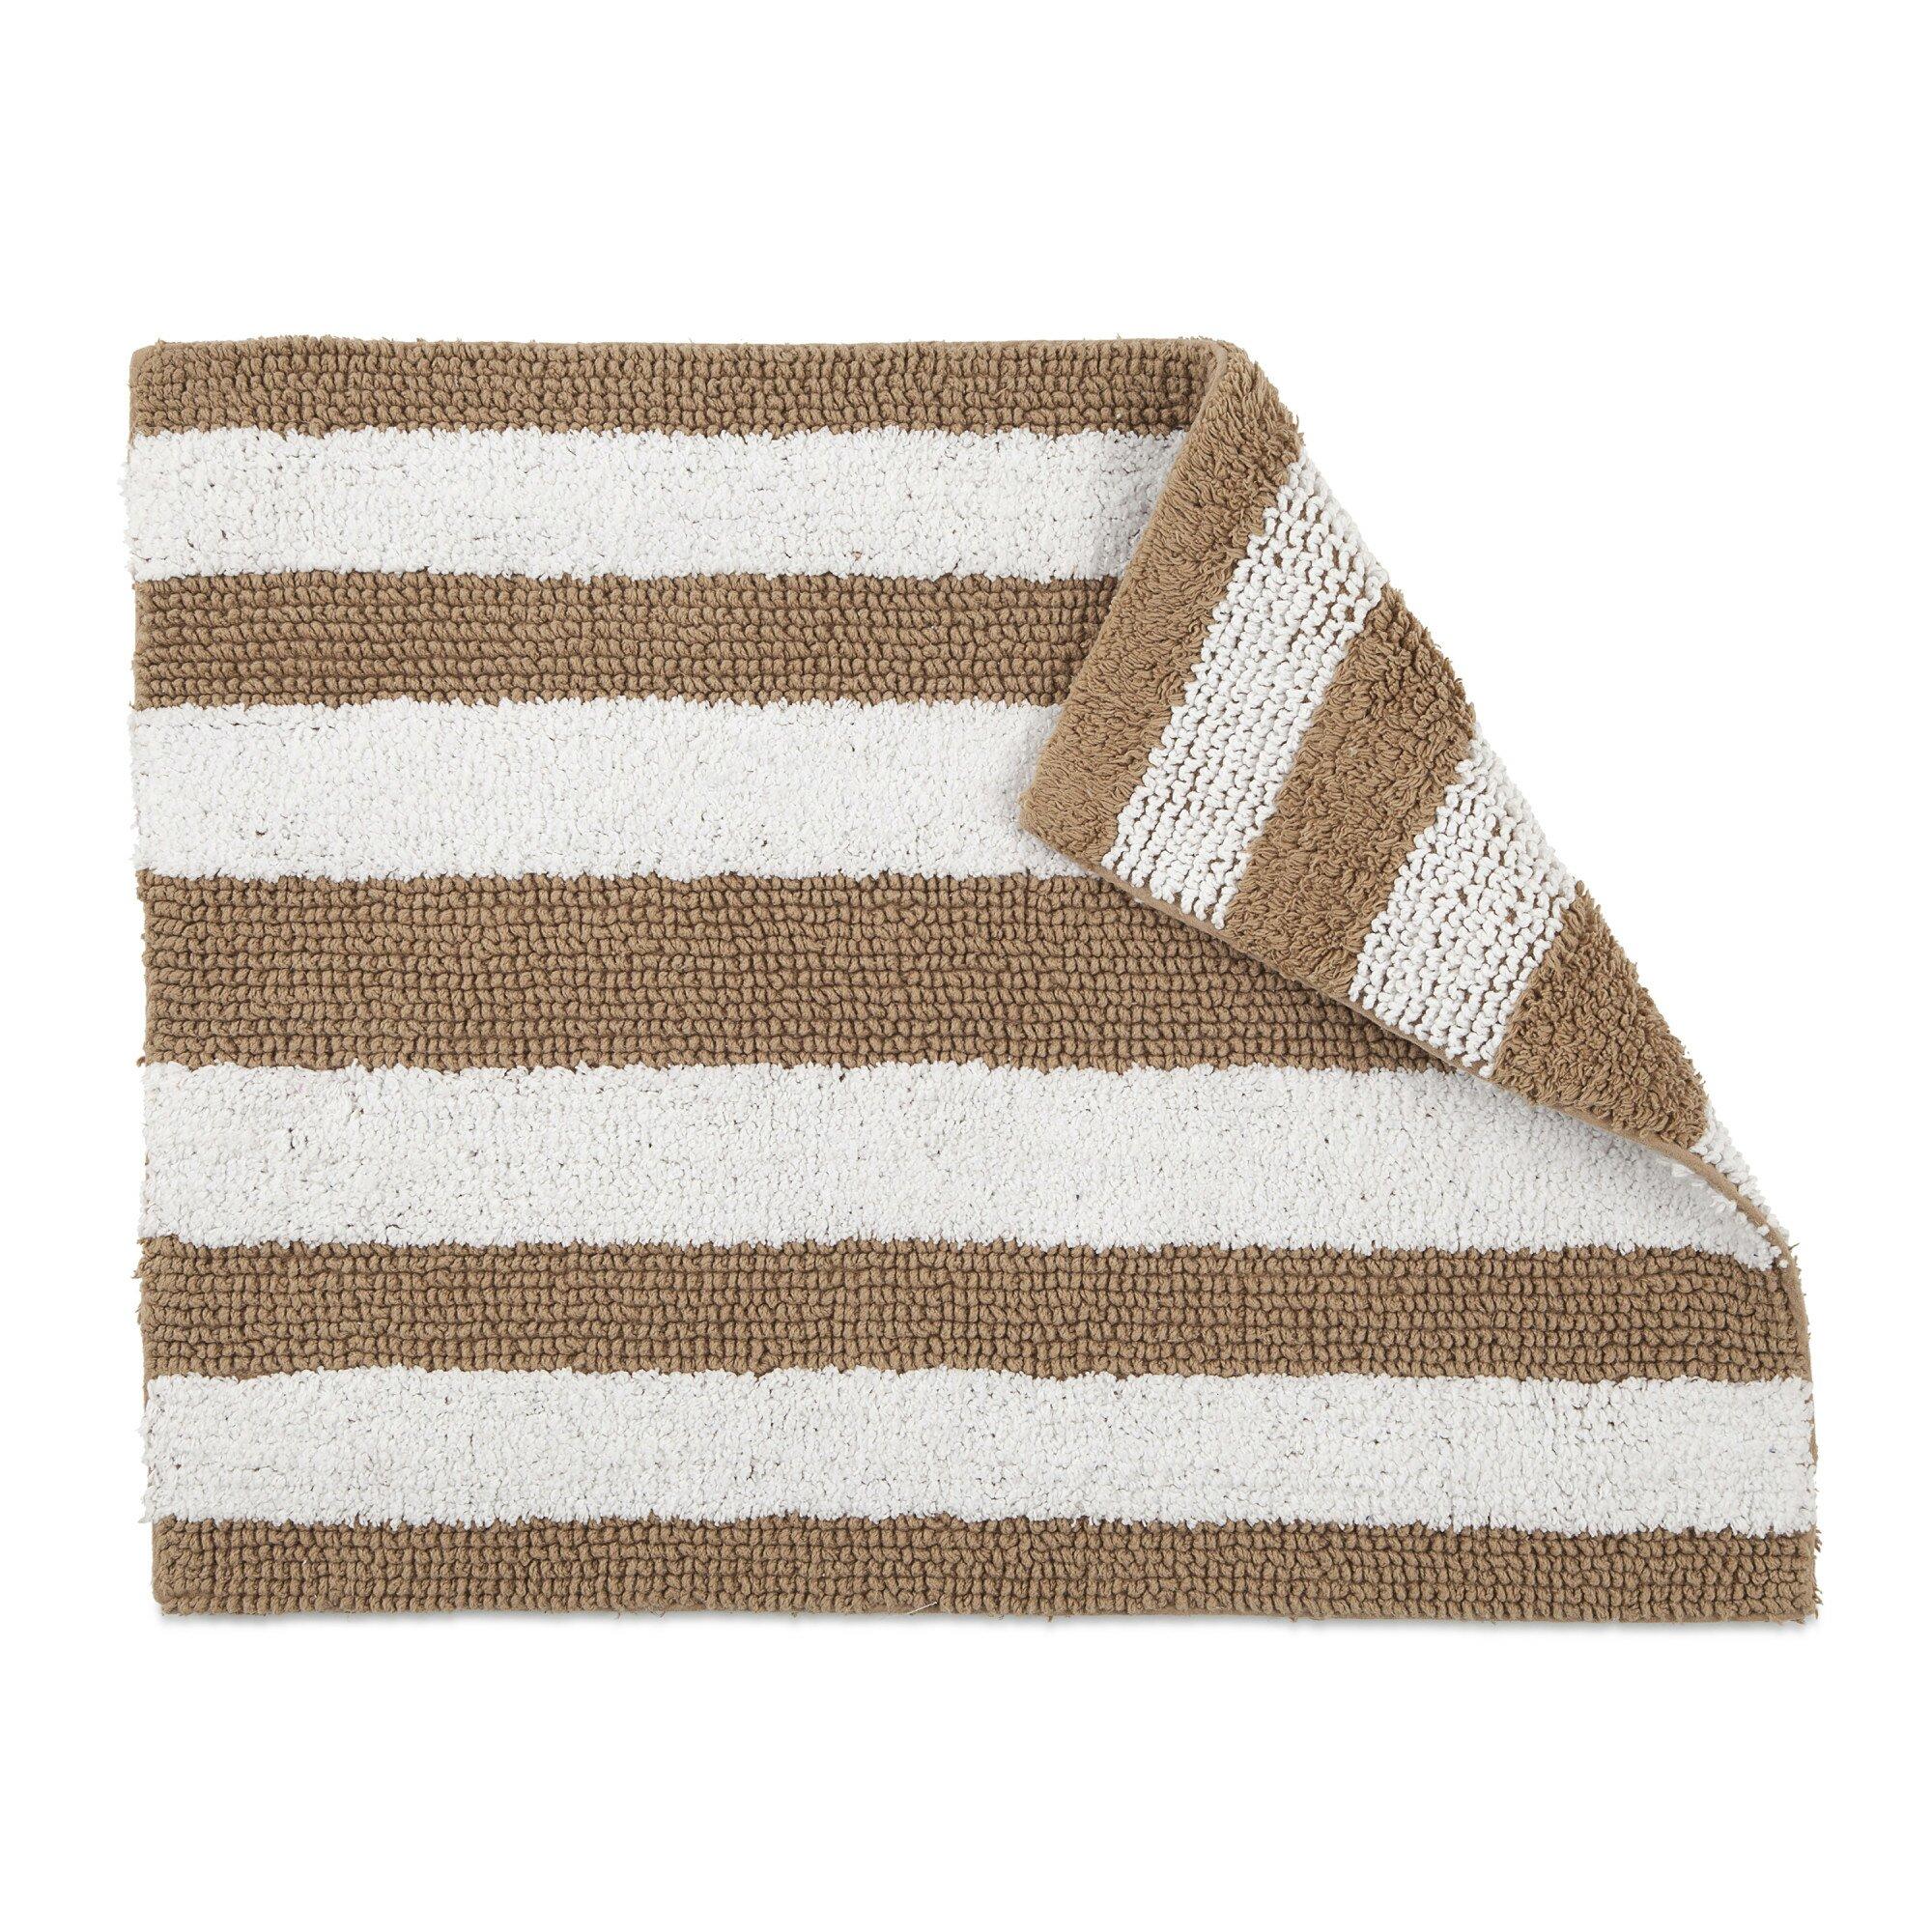 Reversible Bathroom Mats: IZOD Reversible Stripe Bath Rug & Reviews